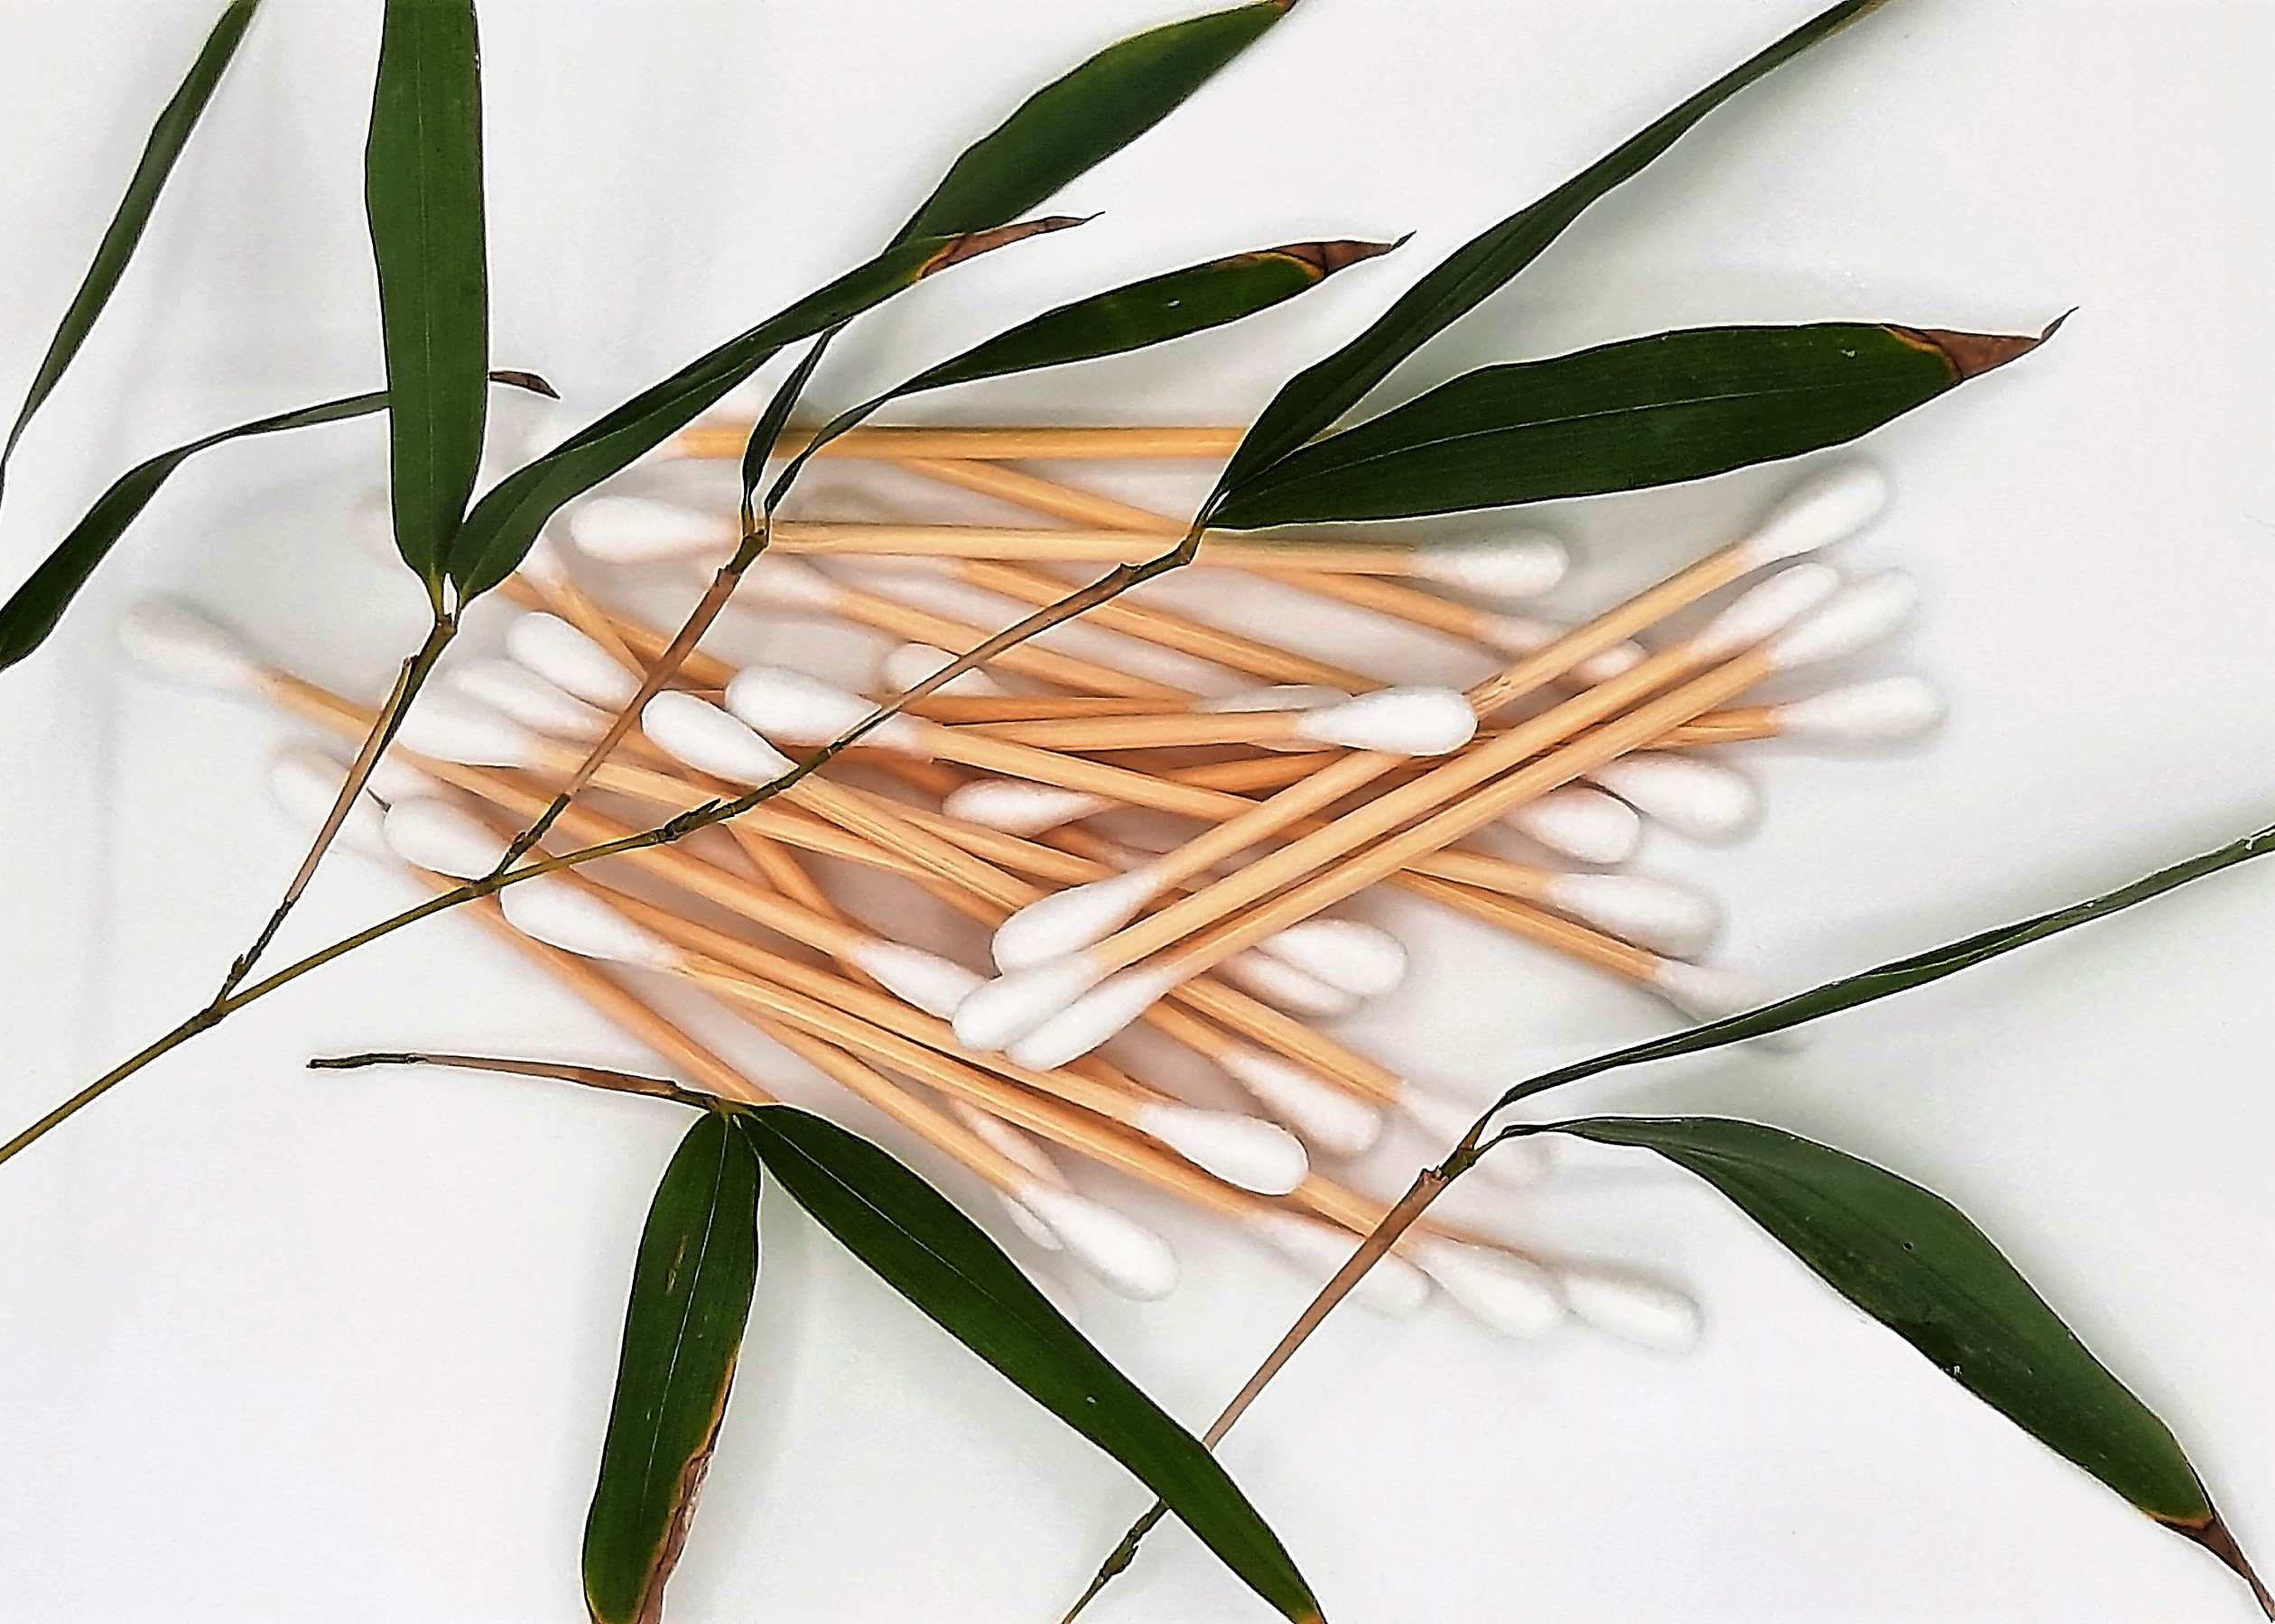 Biodegradable bamboo buds